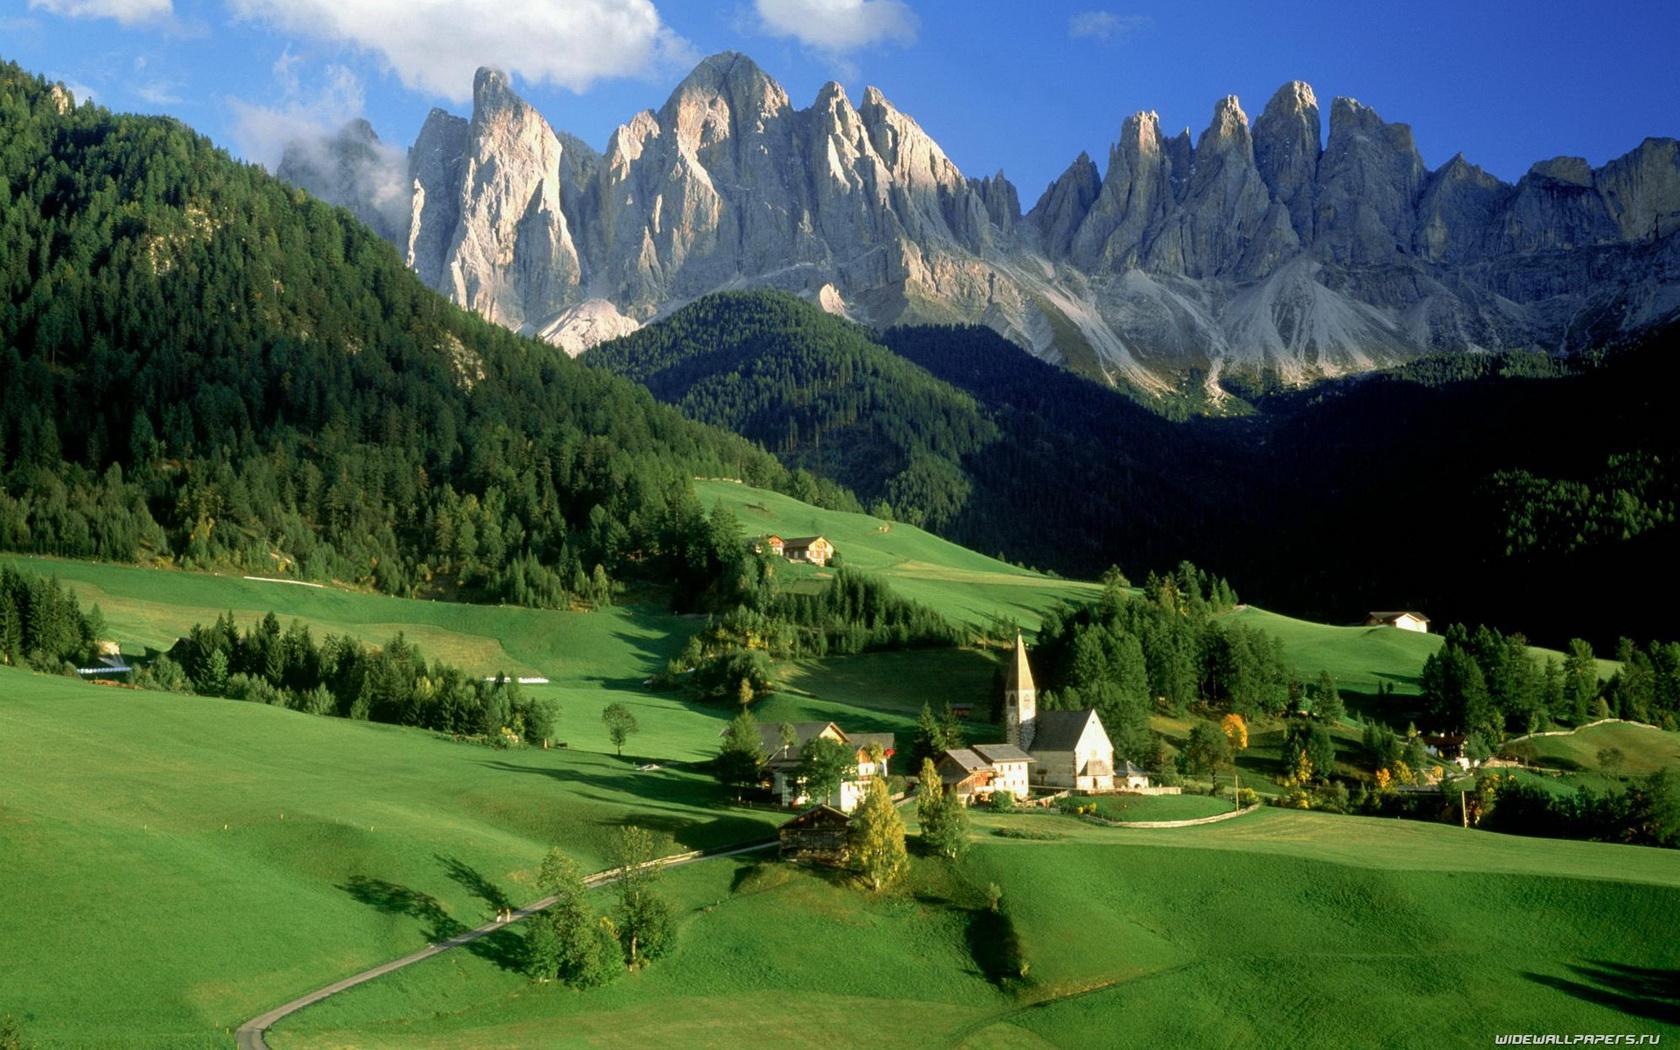 mountain nature hd wallpapers top beautiful desktop nature images 1680x1050